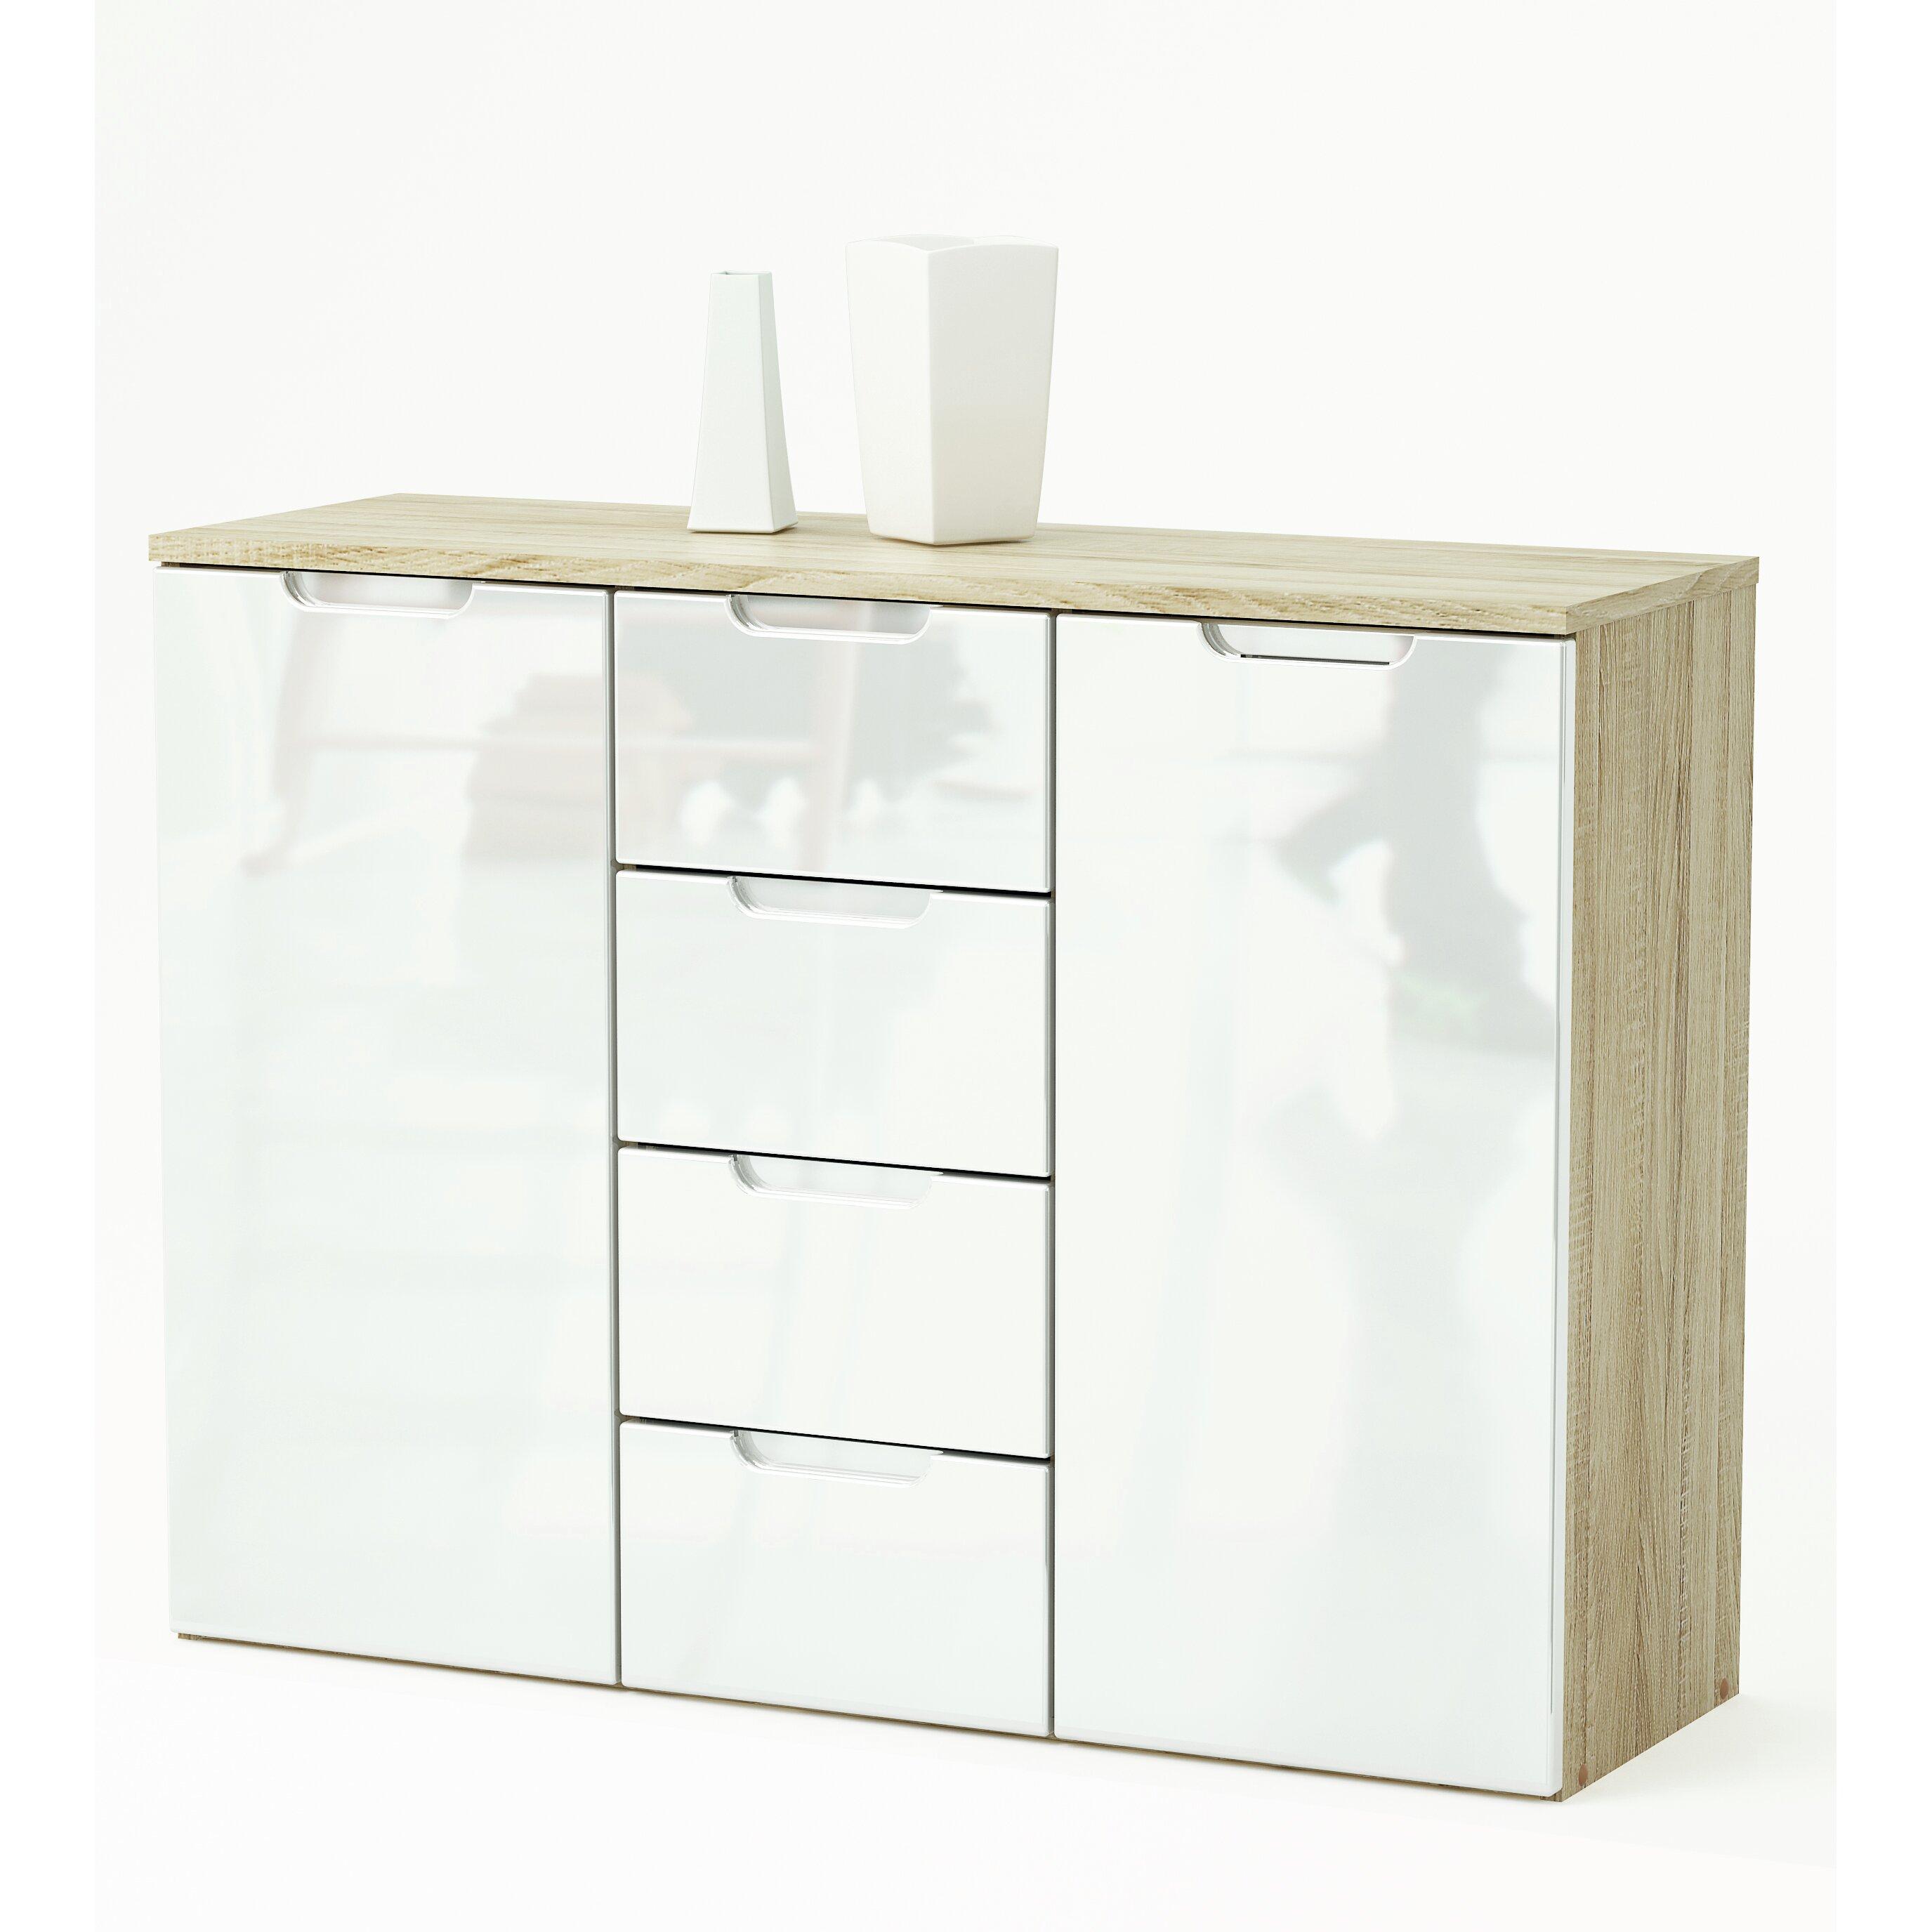 Home haus pelee 2 door 4 drawer sideboard reviews for Meuble salle de bain conforama